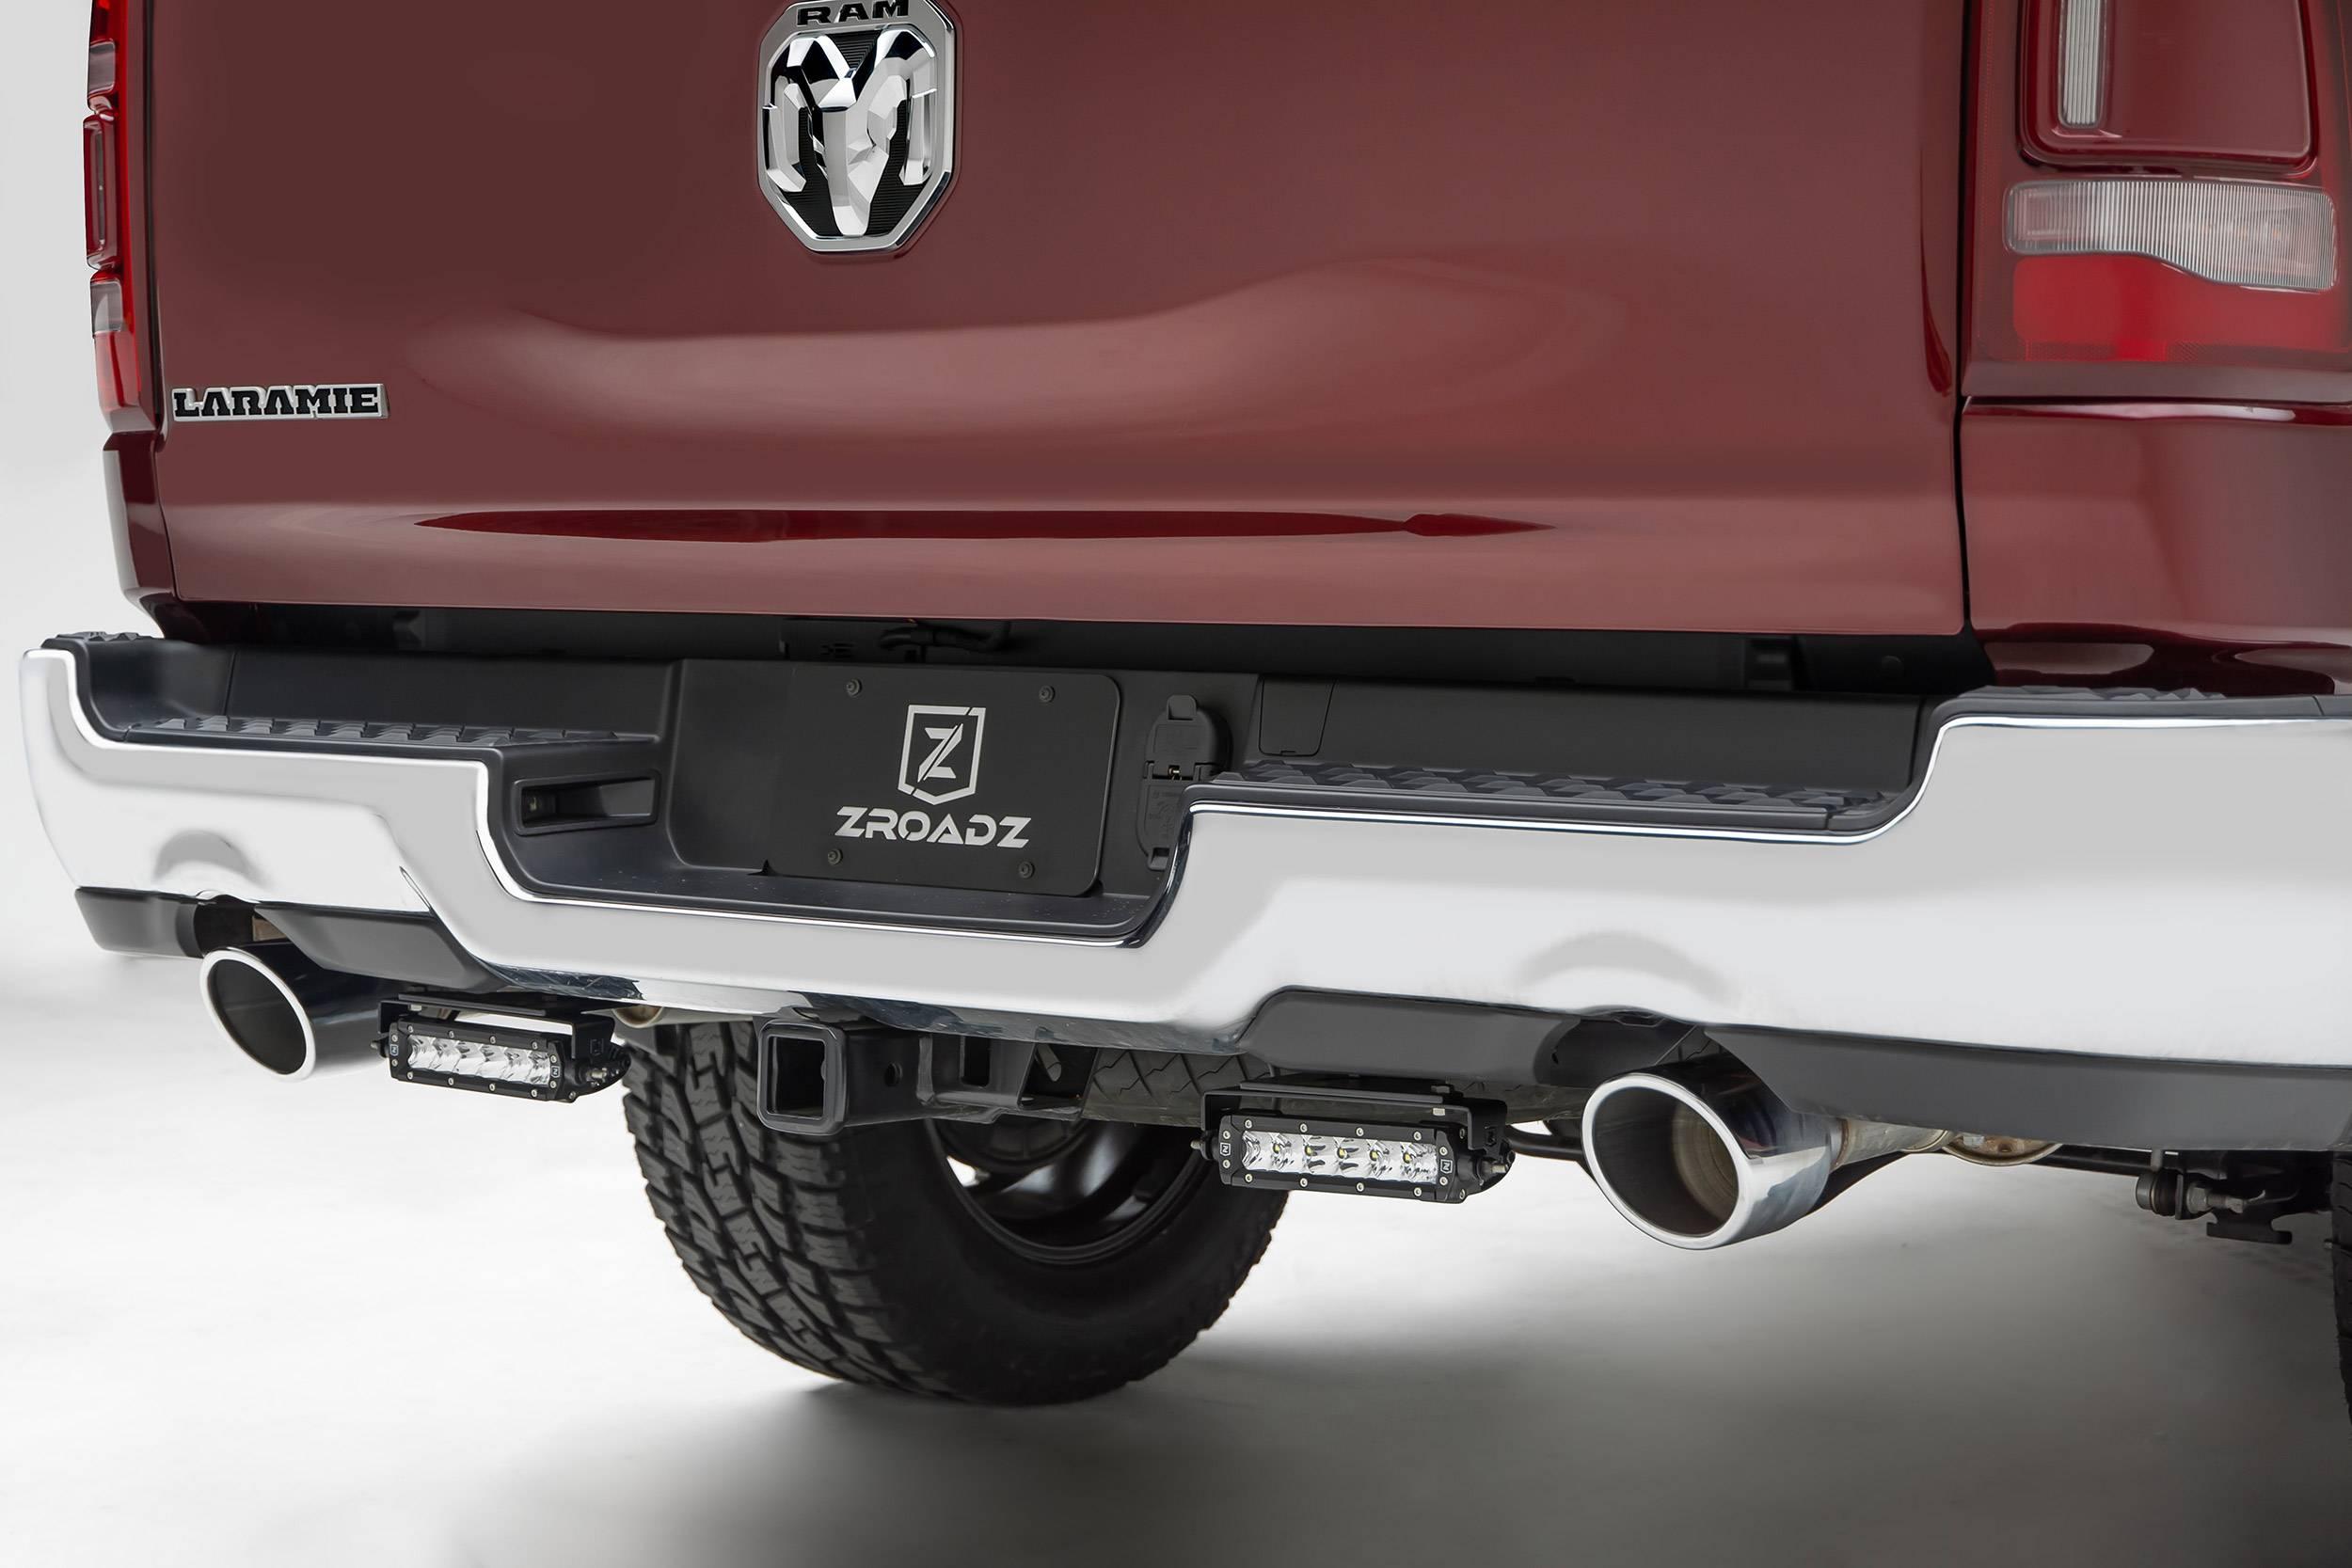 Ram 1500 Bumper >> 2019 Ram 1500 Rear Bumper Led Bracket To Mount 2 6 Inch Straight Light Bar Pn Z384821